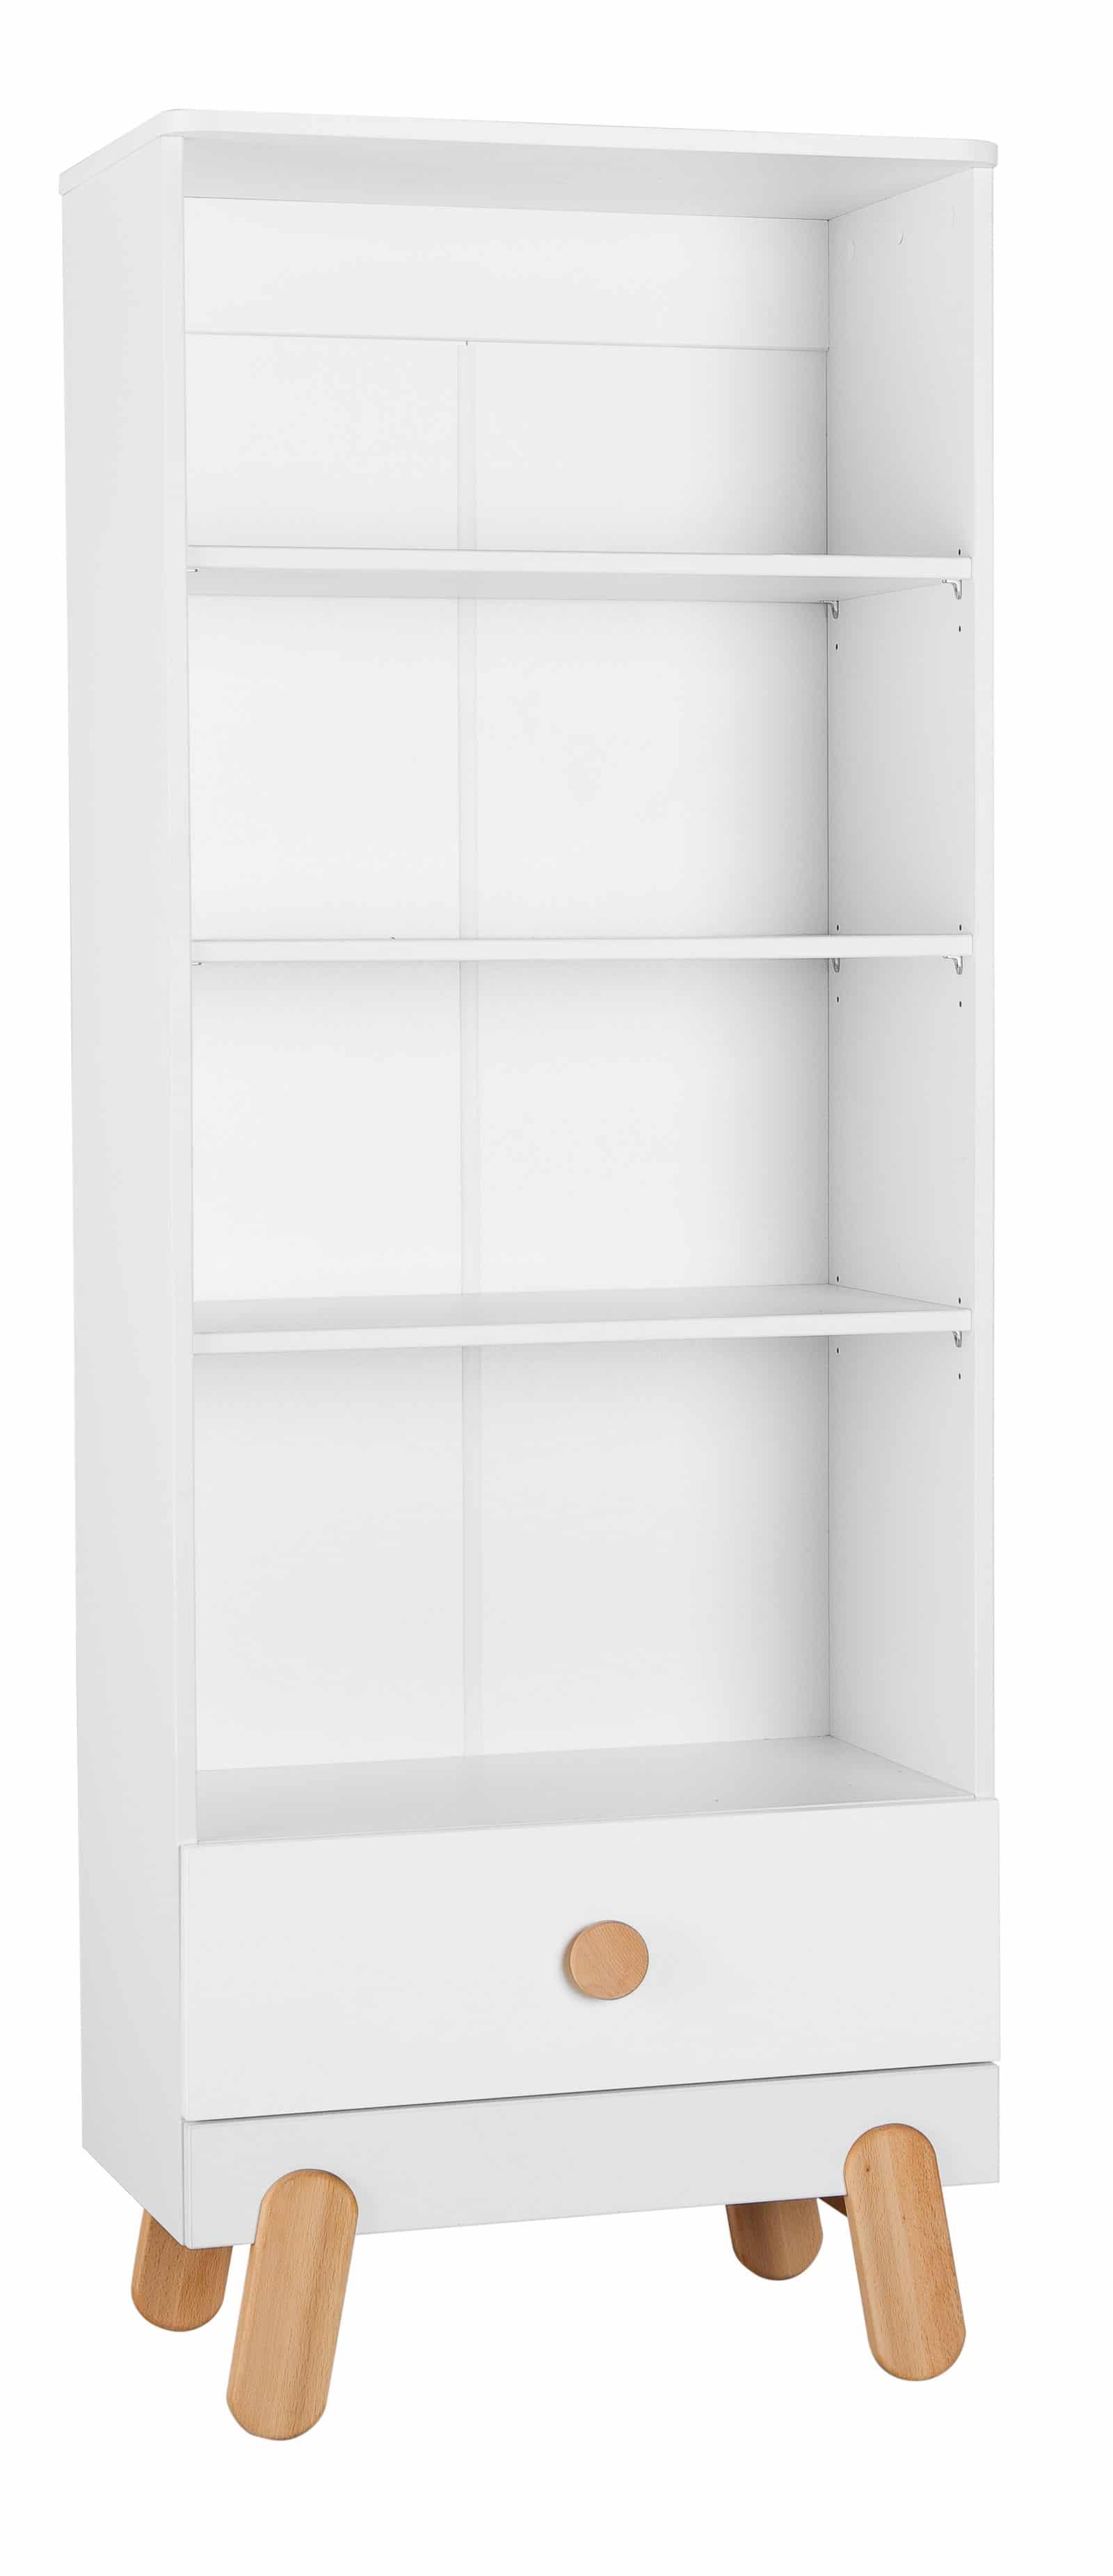 Pinio iga 6 meubles lit 140x70 commode armoire 2 for Armoire murale bureau